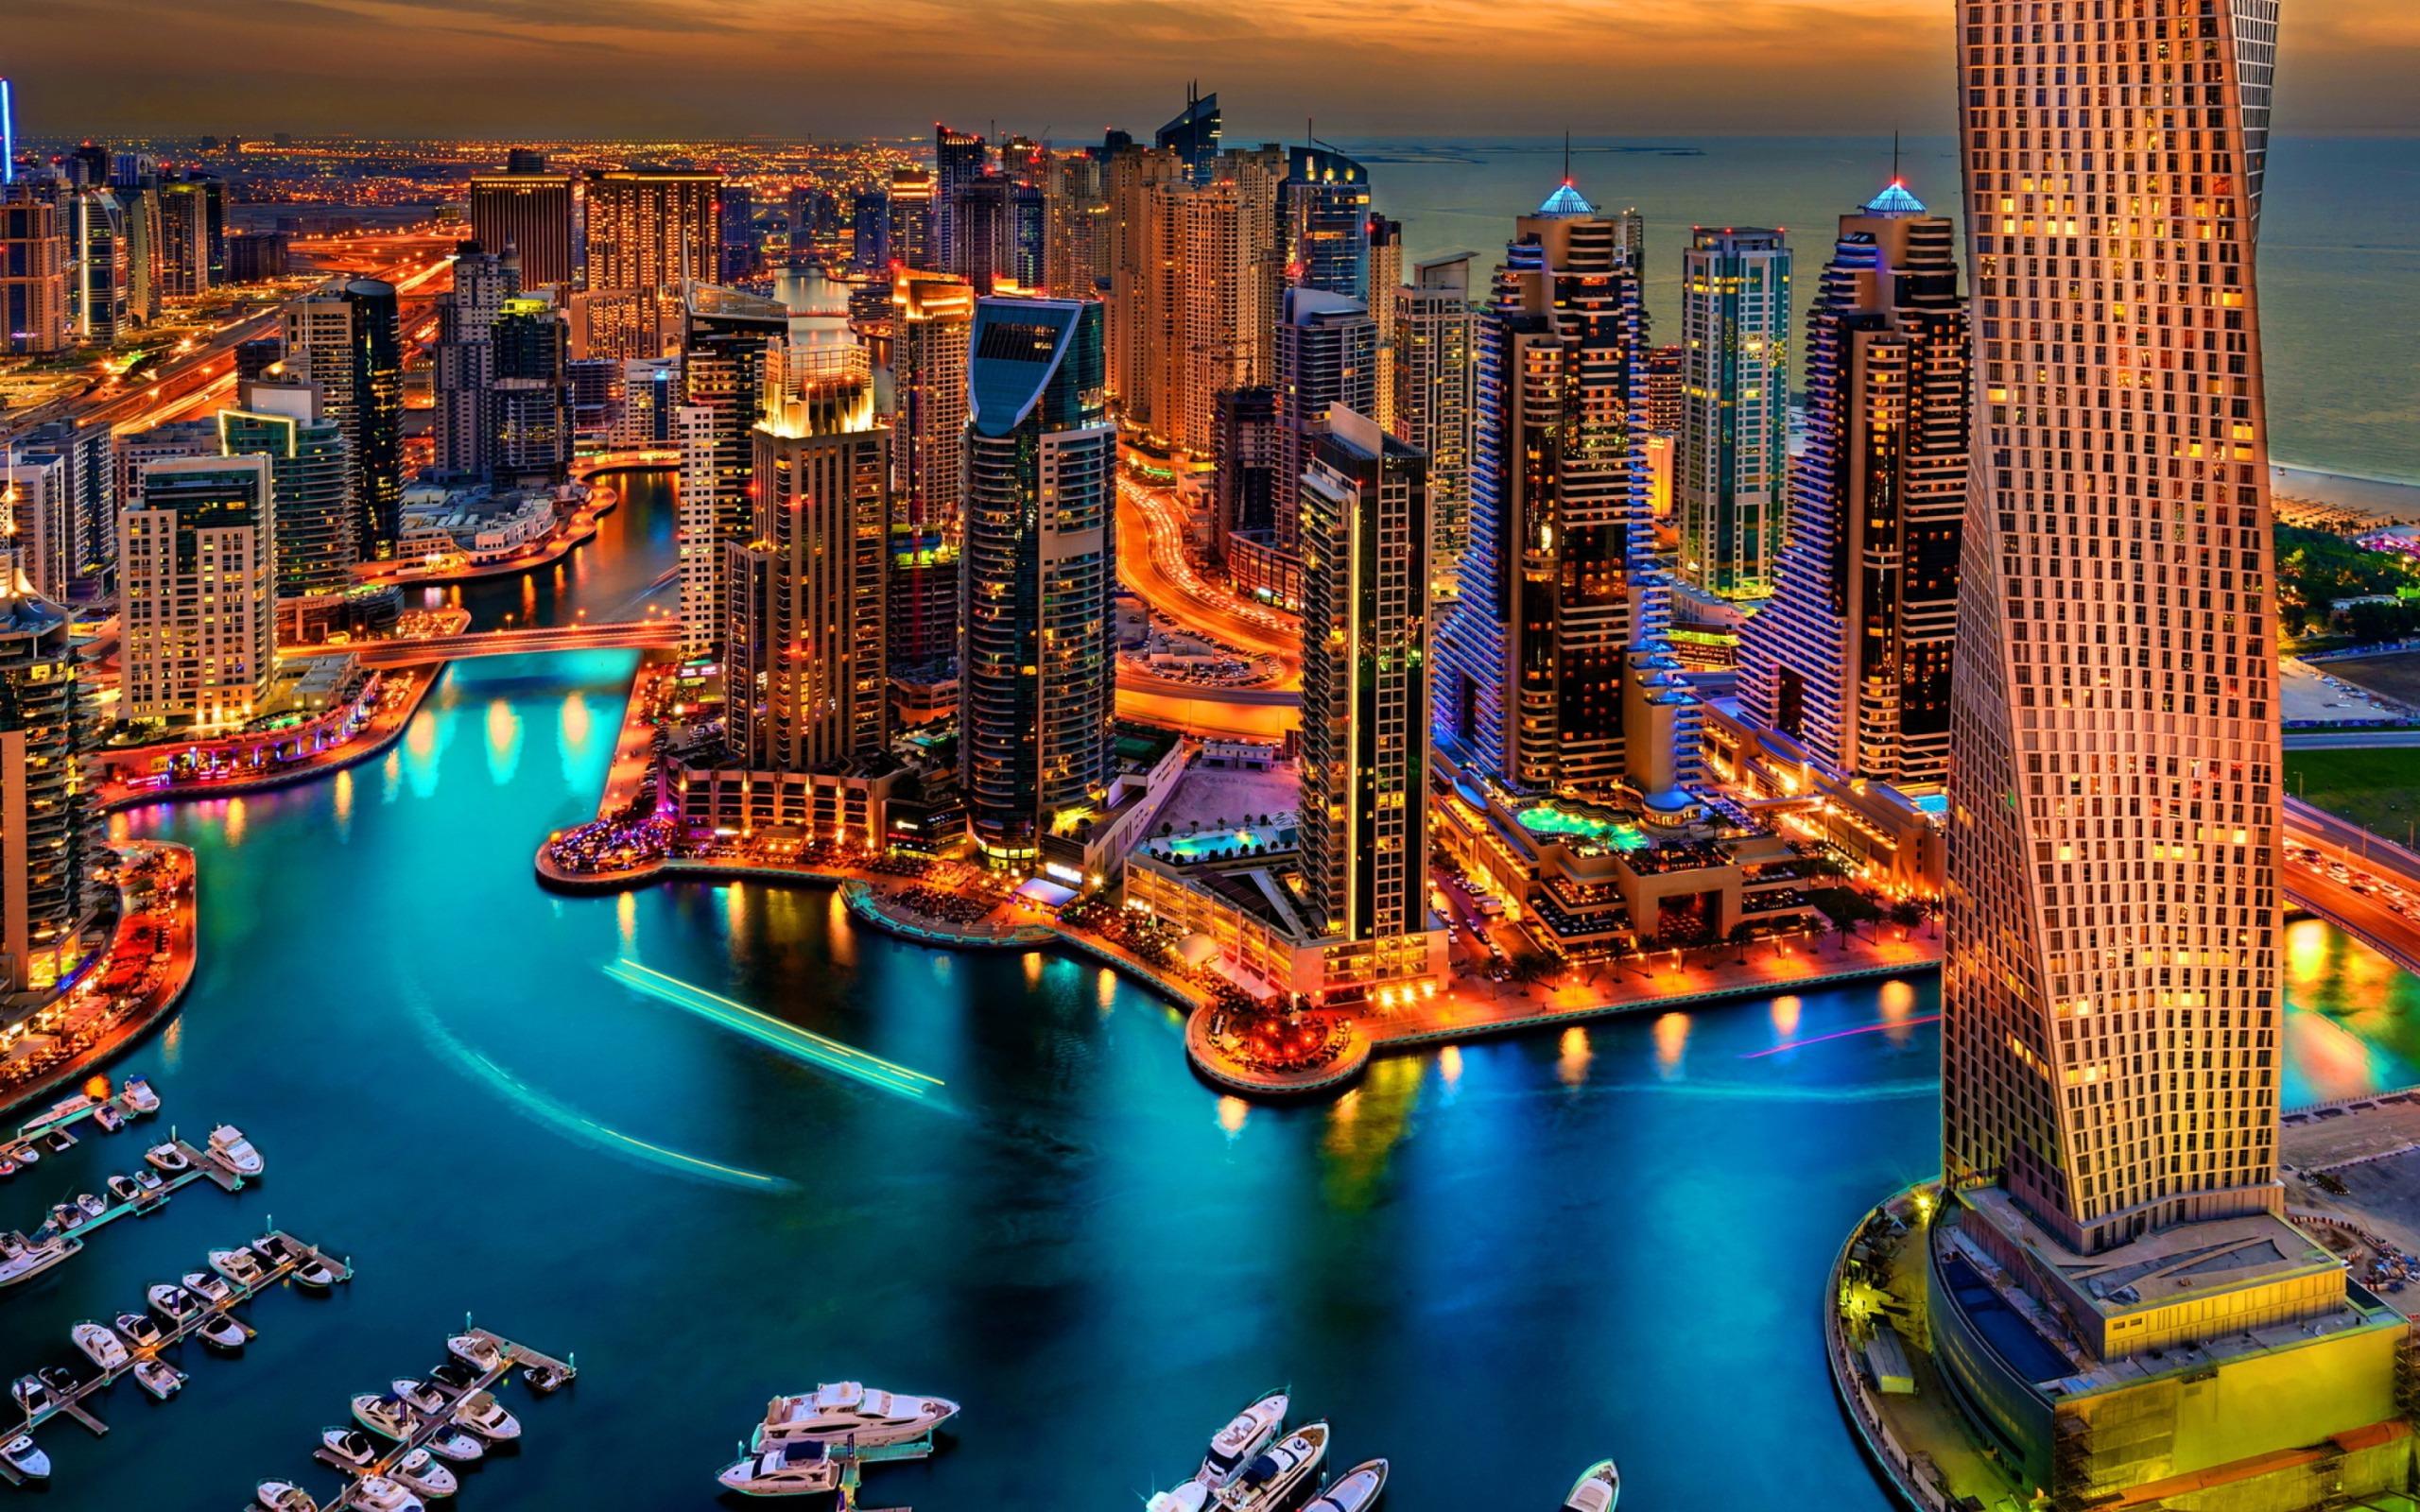 Dubai-Marina-And-Yachts-2560x1600